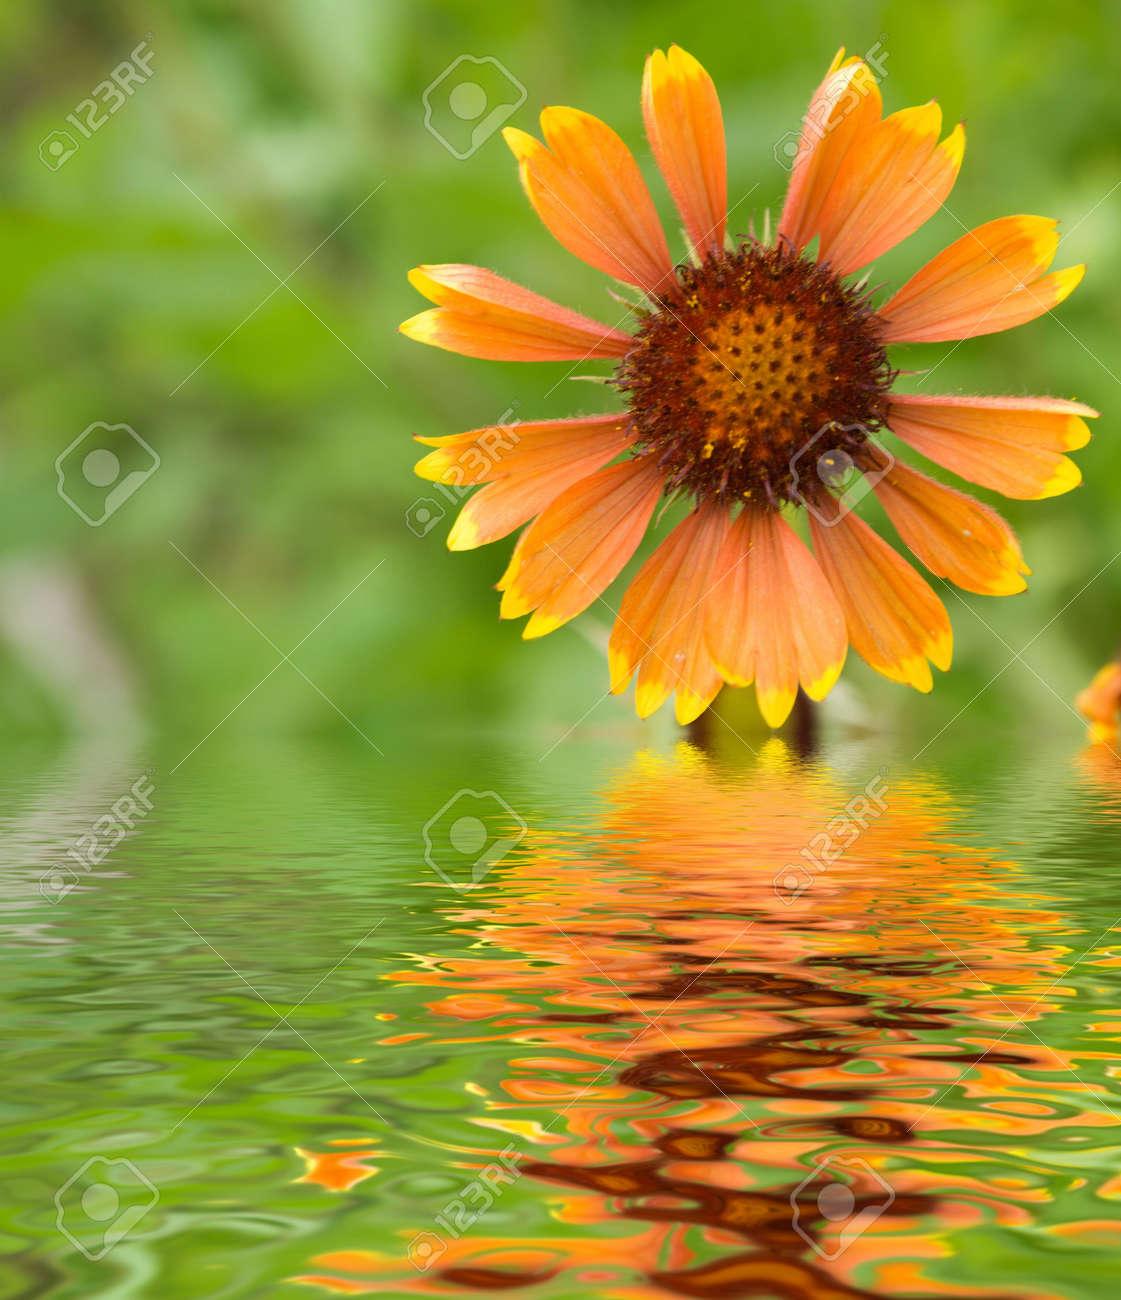 Flowers in a garden witn reflection Stock Photo - 522949